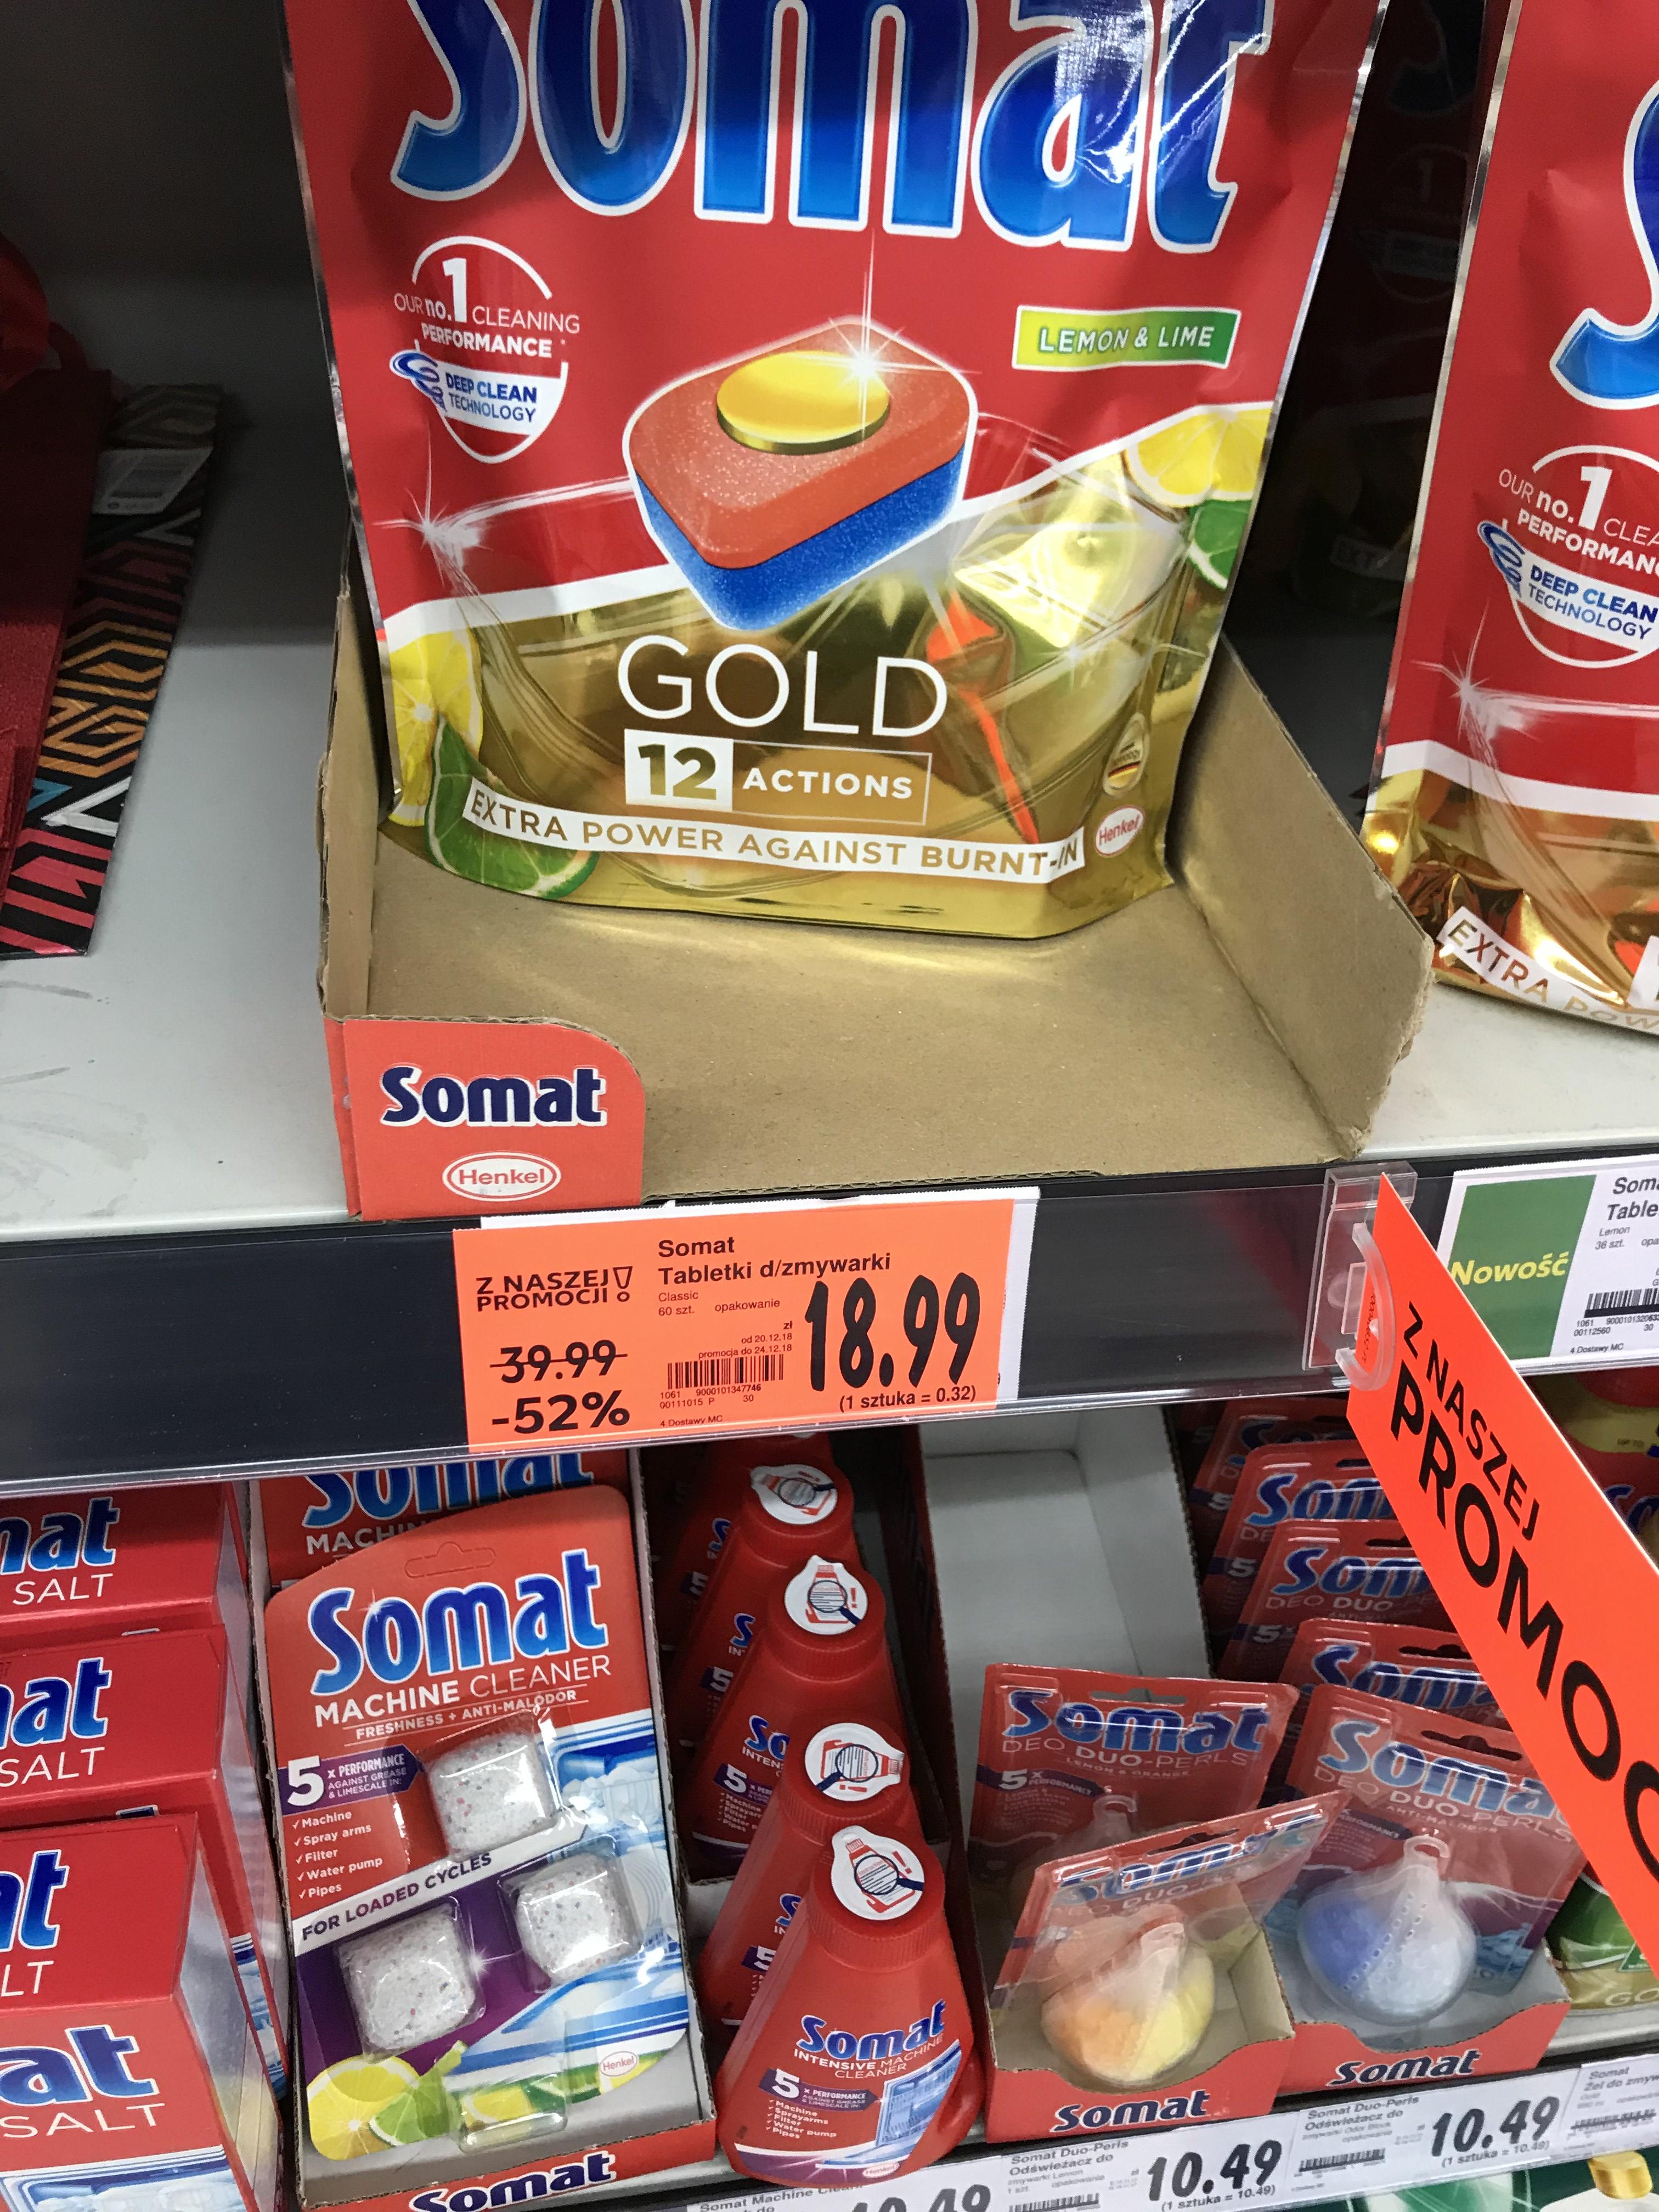 Somat Gold - tabletki do zmywarki 60 szt // 12 in 1